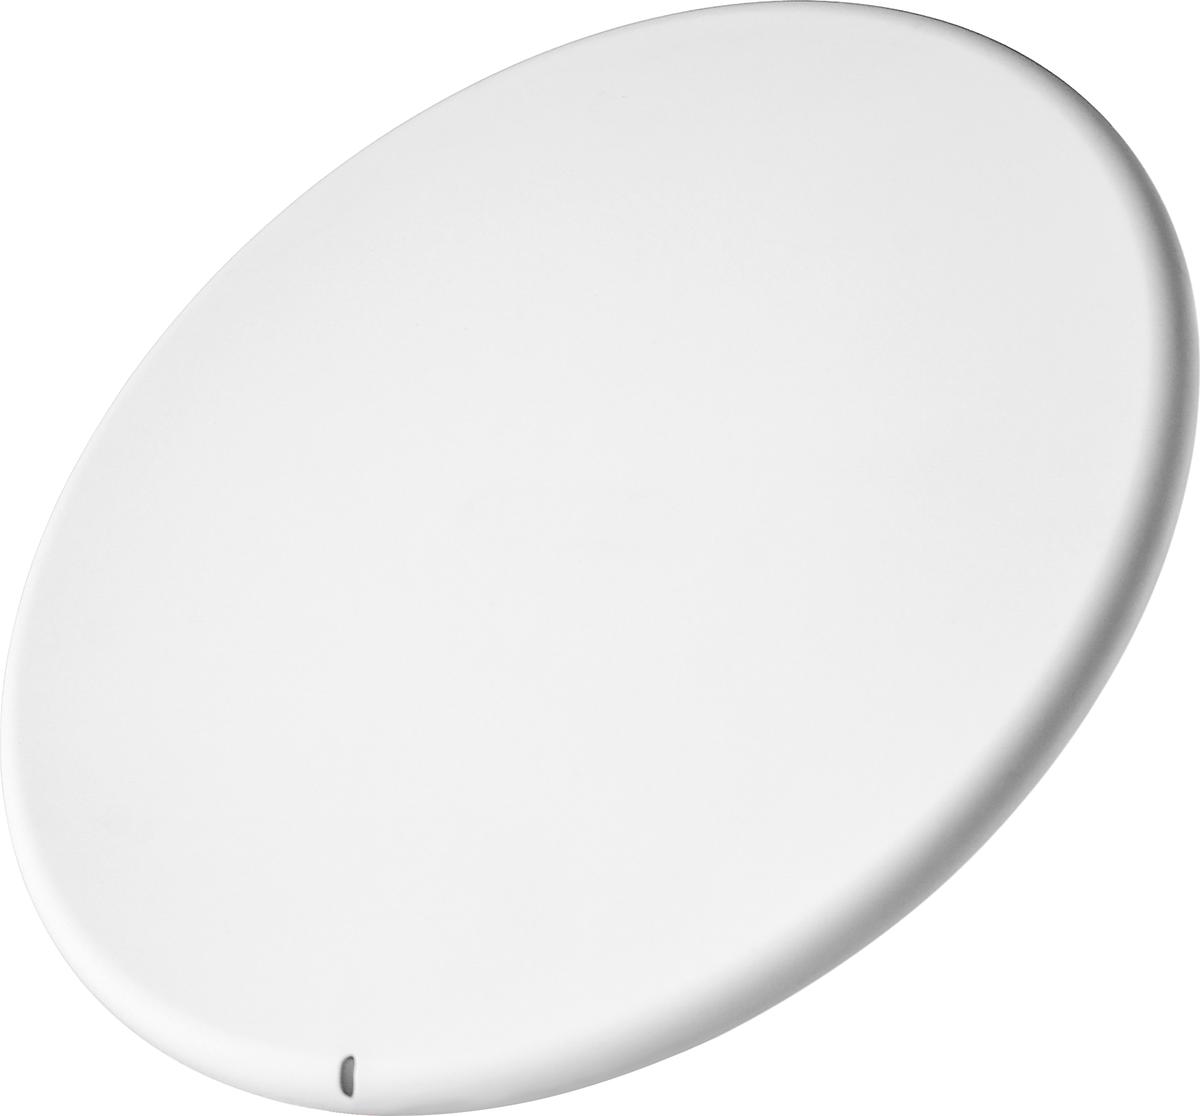 цена на Беспроводное зарядное устройство uBear Flow Wireless Charger, WL02WH10-AD, белый